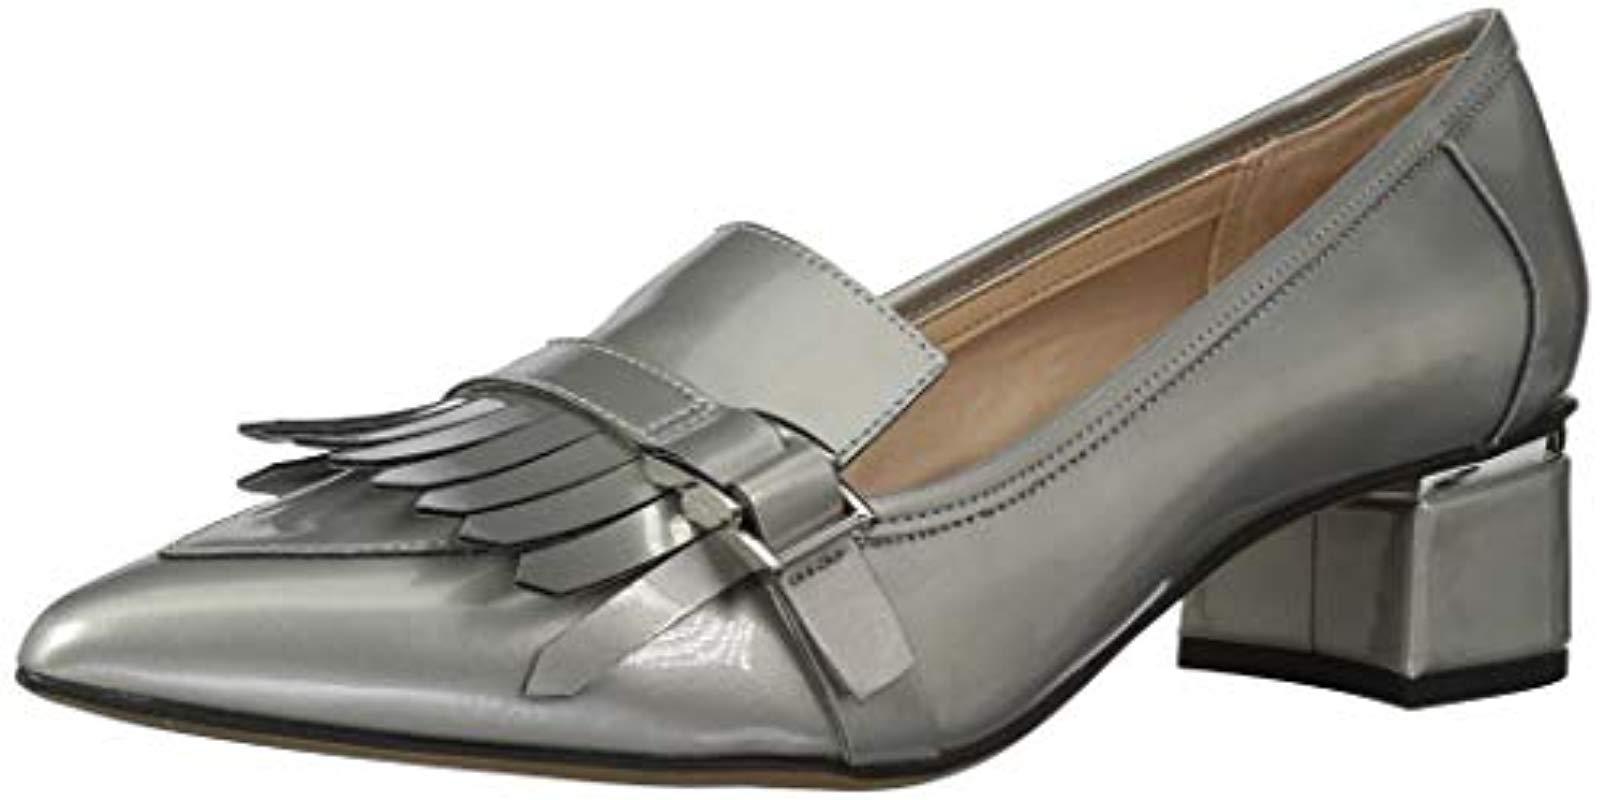 8ad1f97d883 Lyst - Franco Sarto Grenoble Loafer in Gray